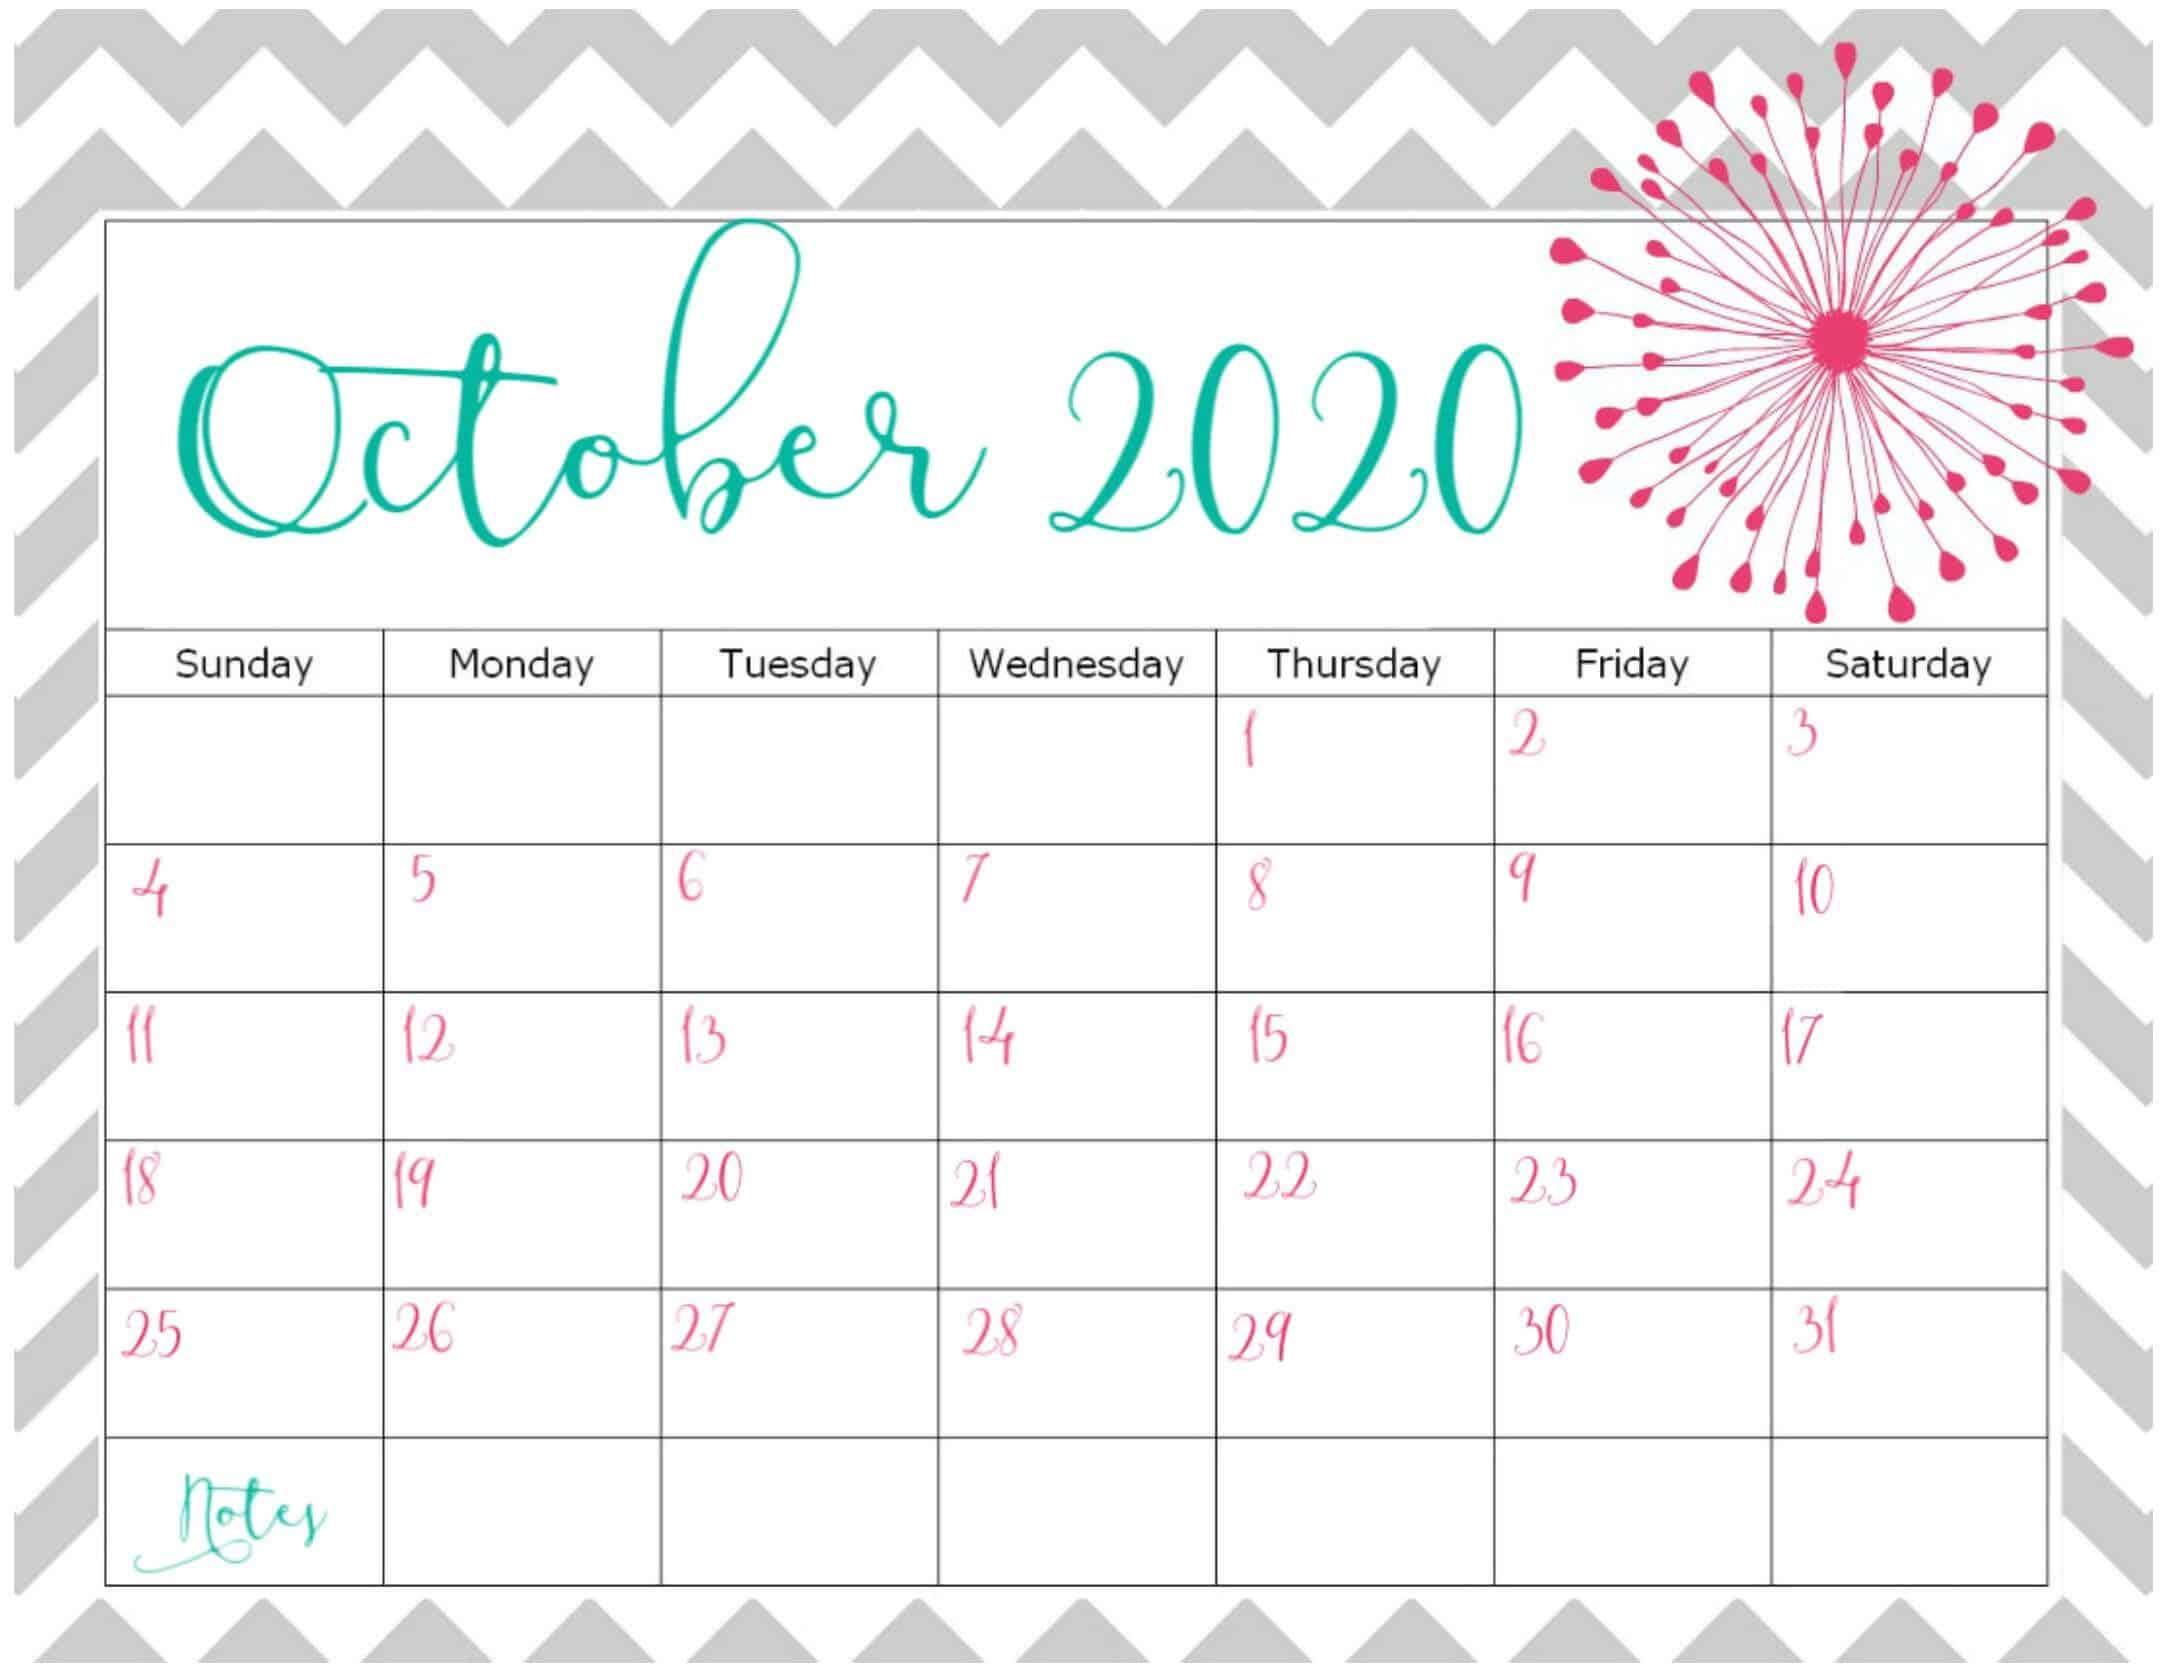 October 2020 Calendar Printable Template